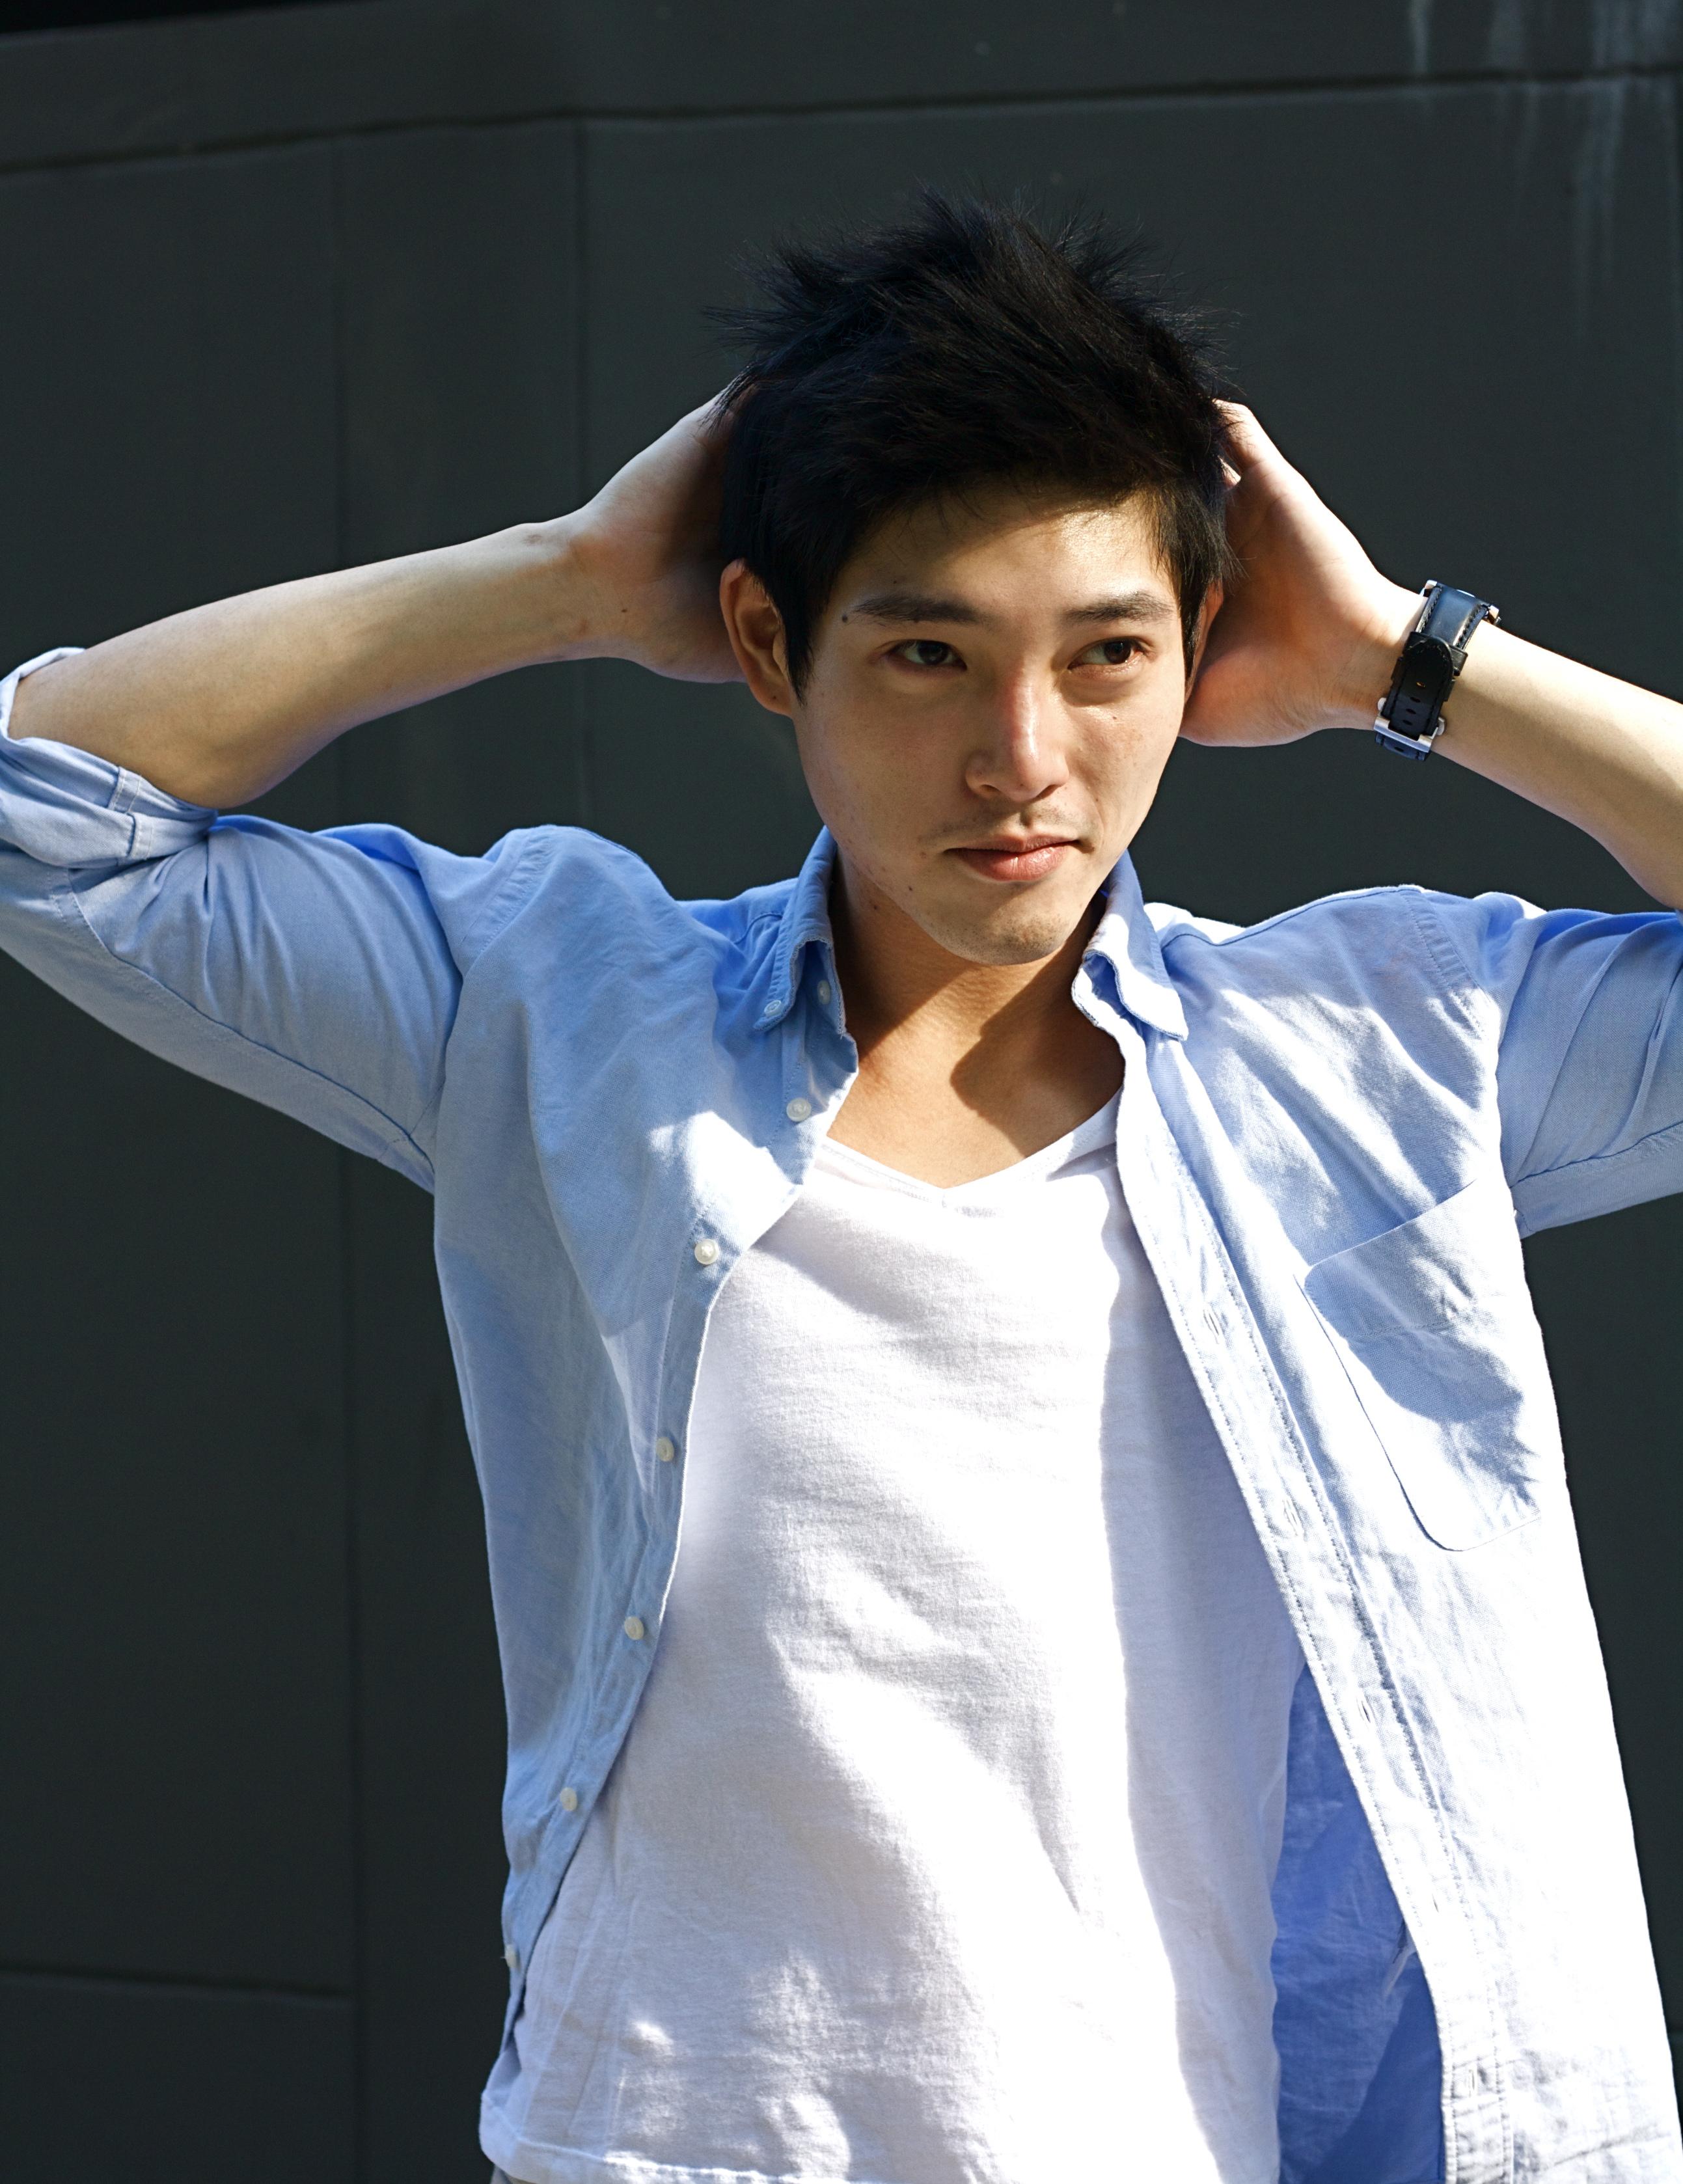 male photo Asian model